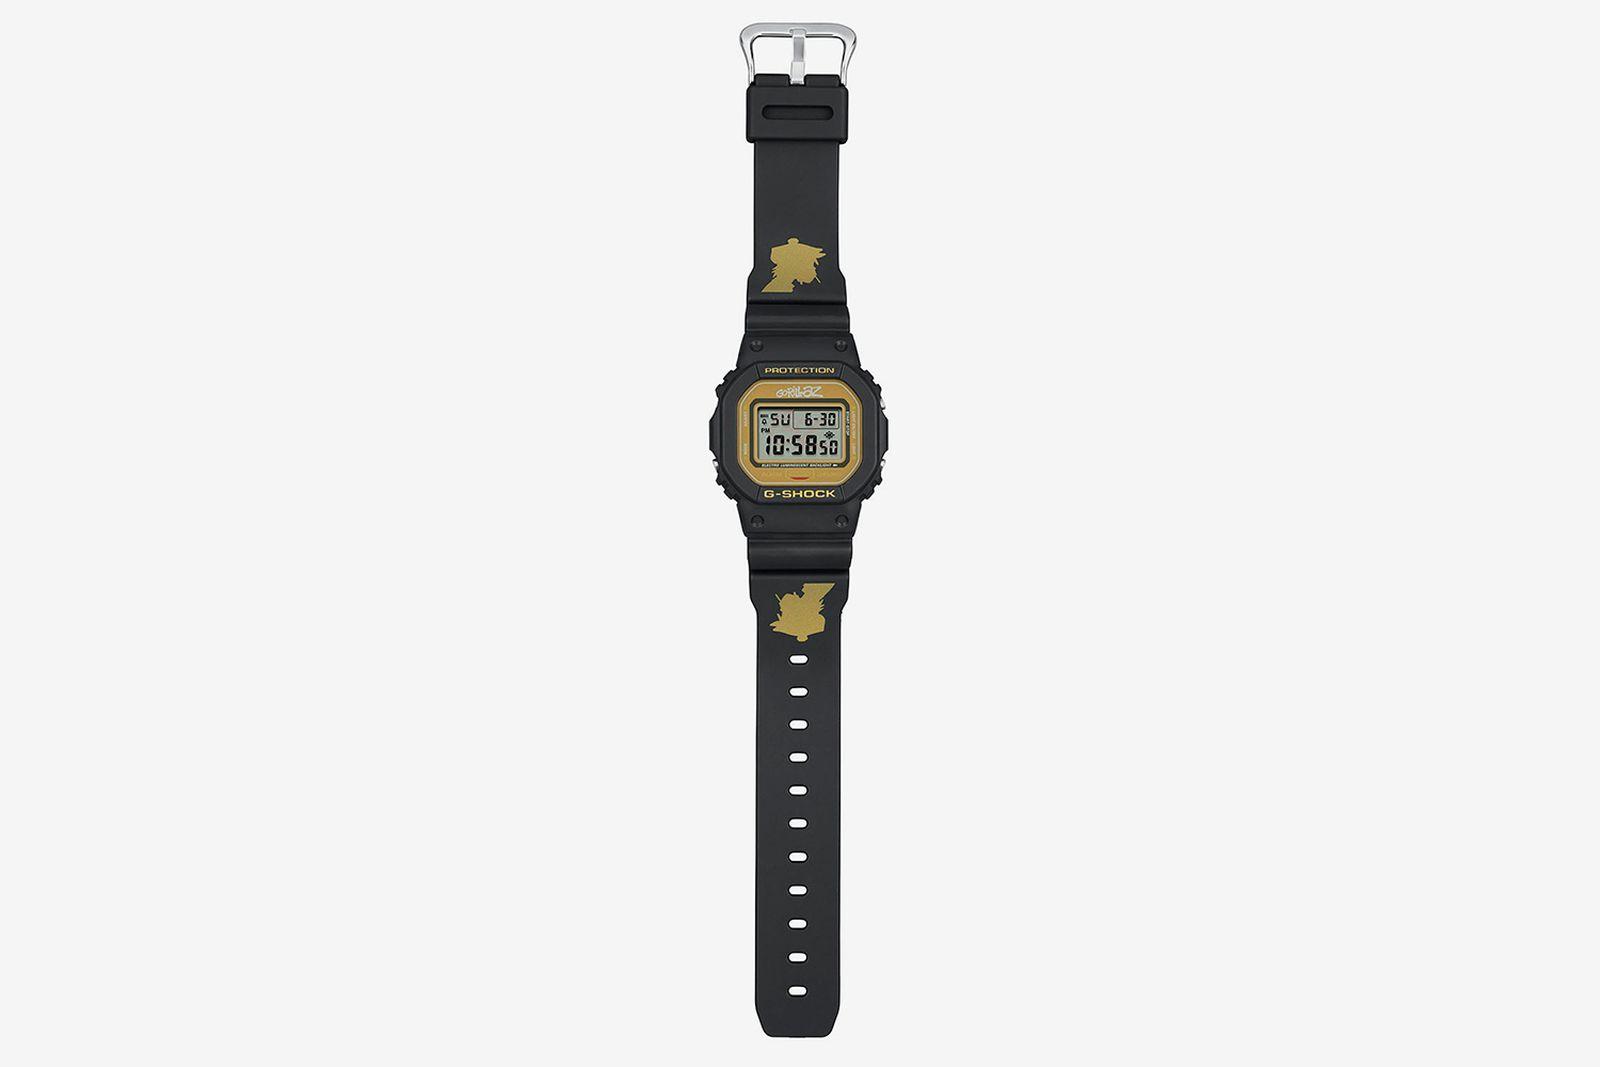 gorillaz g shock dw5600 watch release date price info G-SHOCK DW-5600